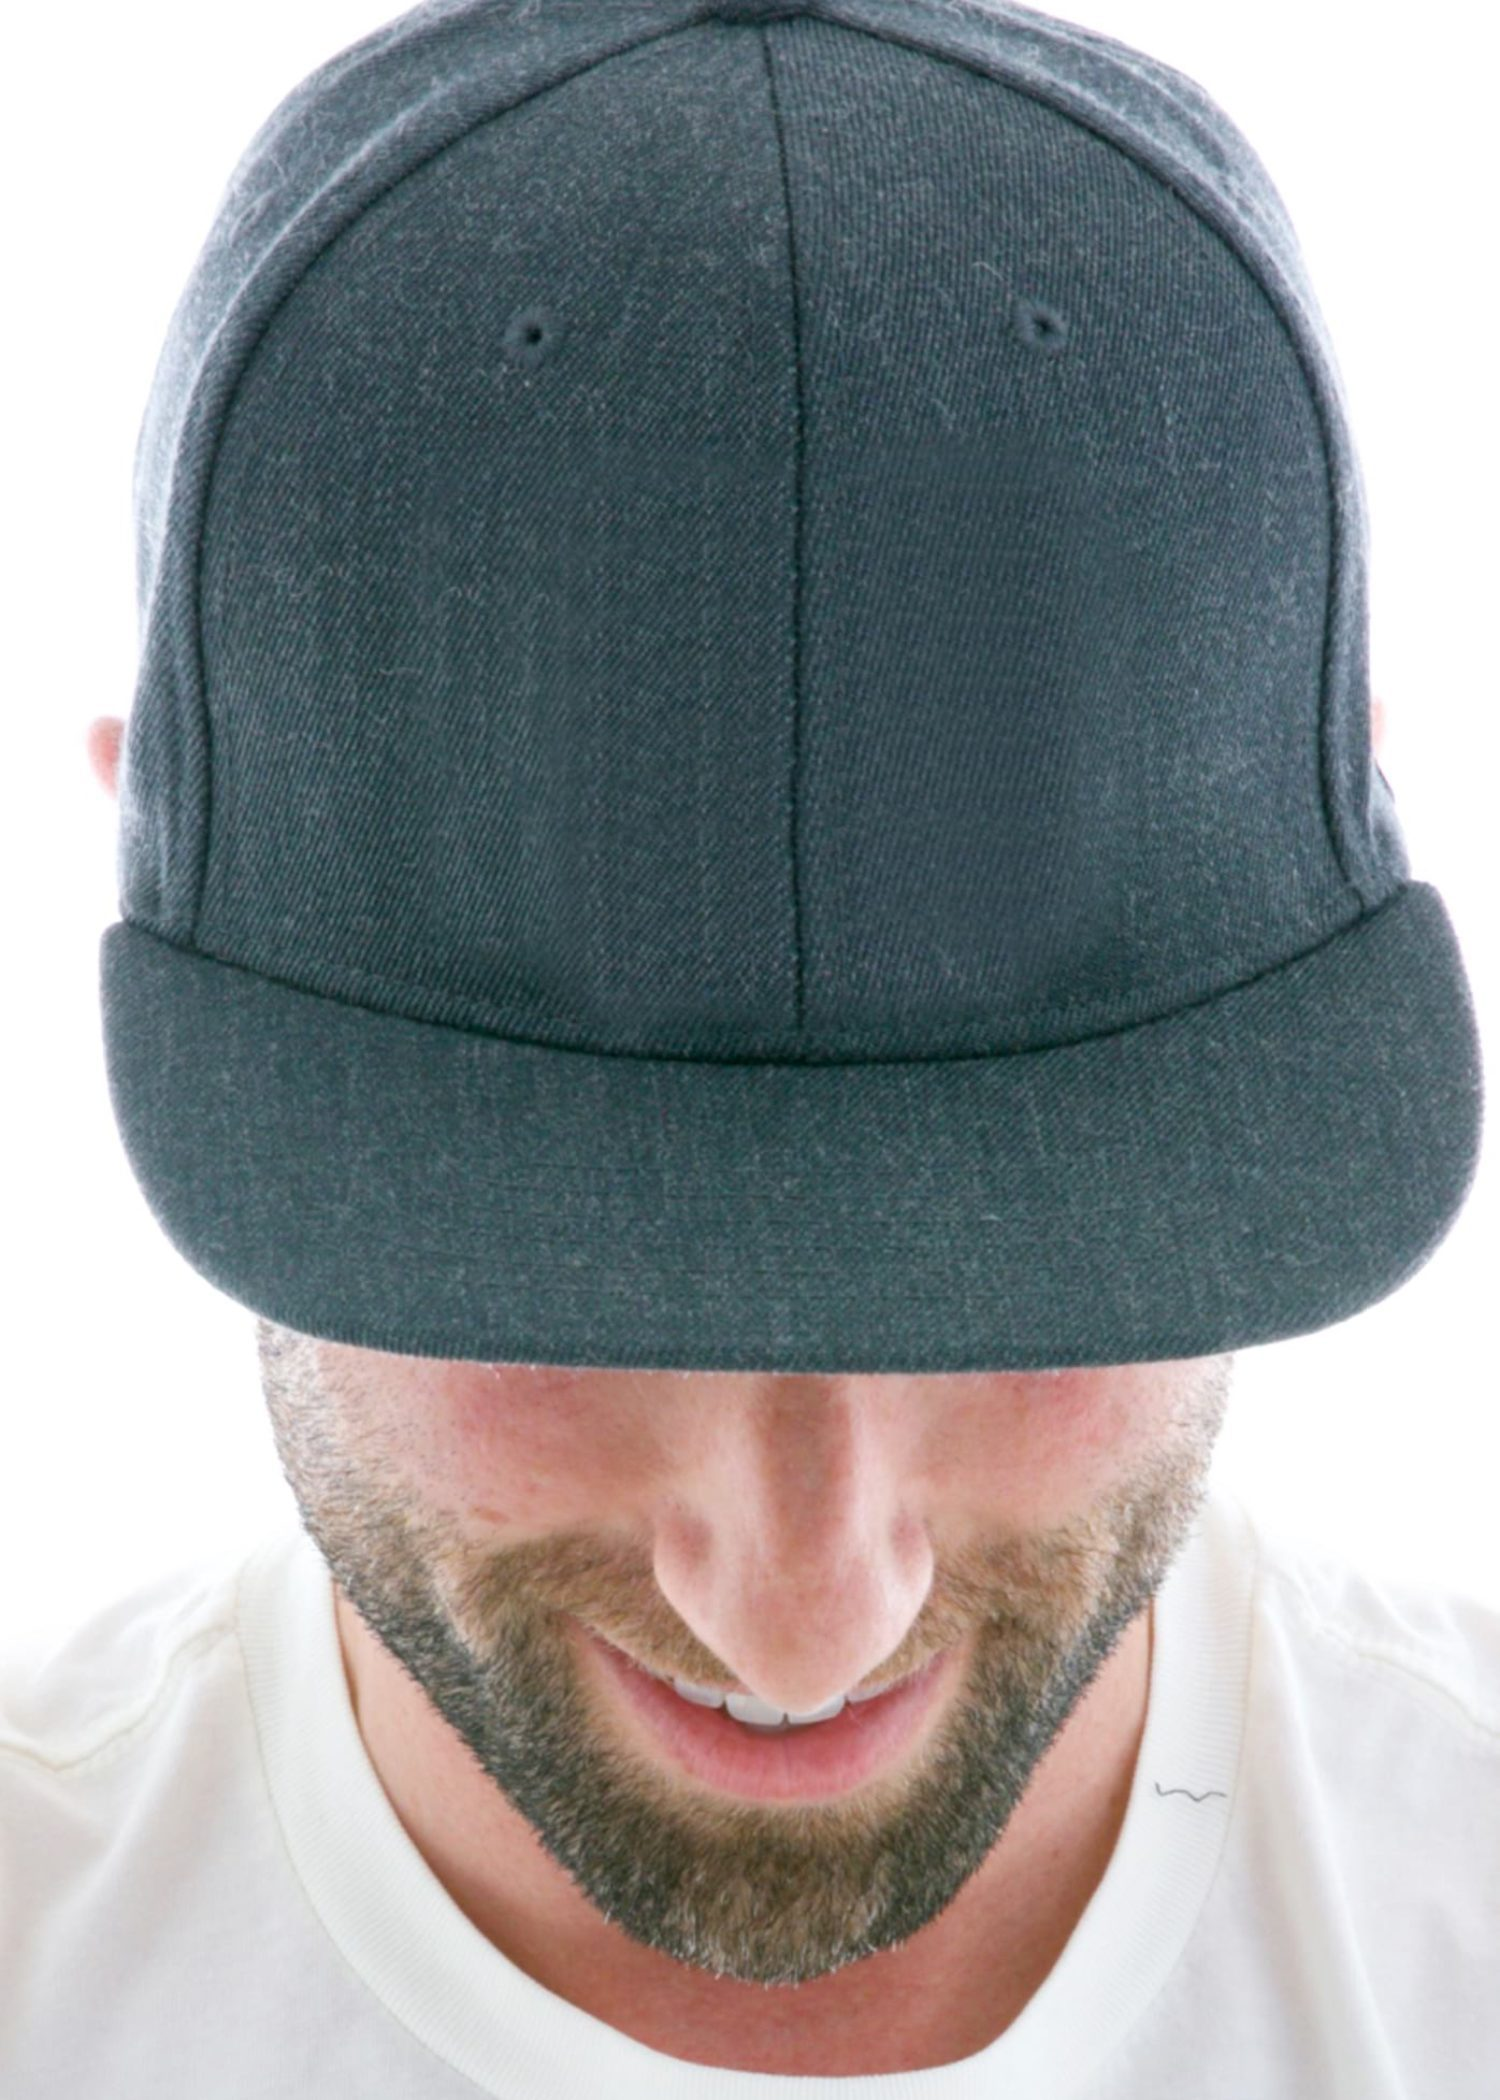 Flat Brim Snapback Hats